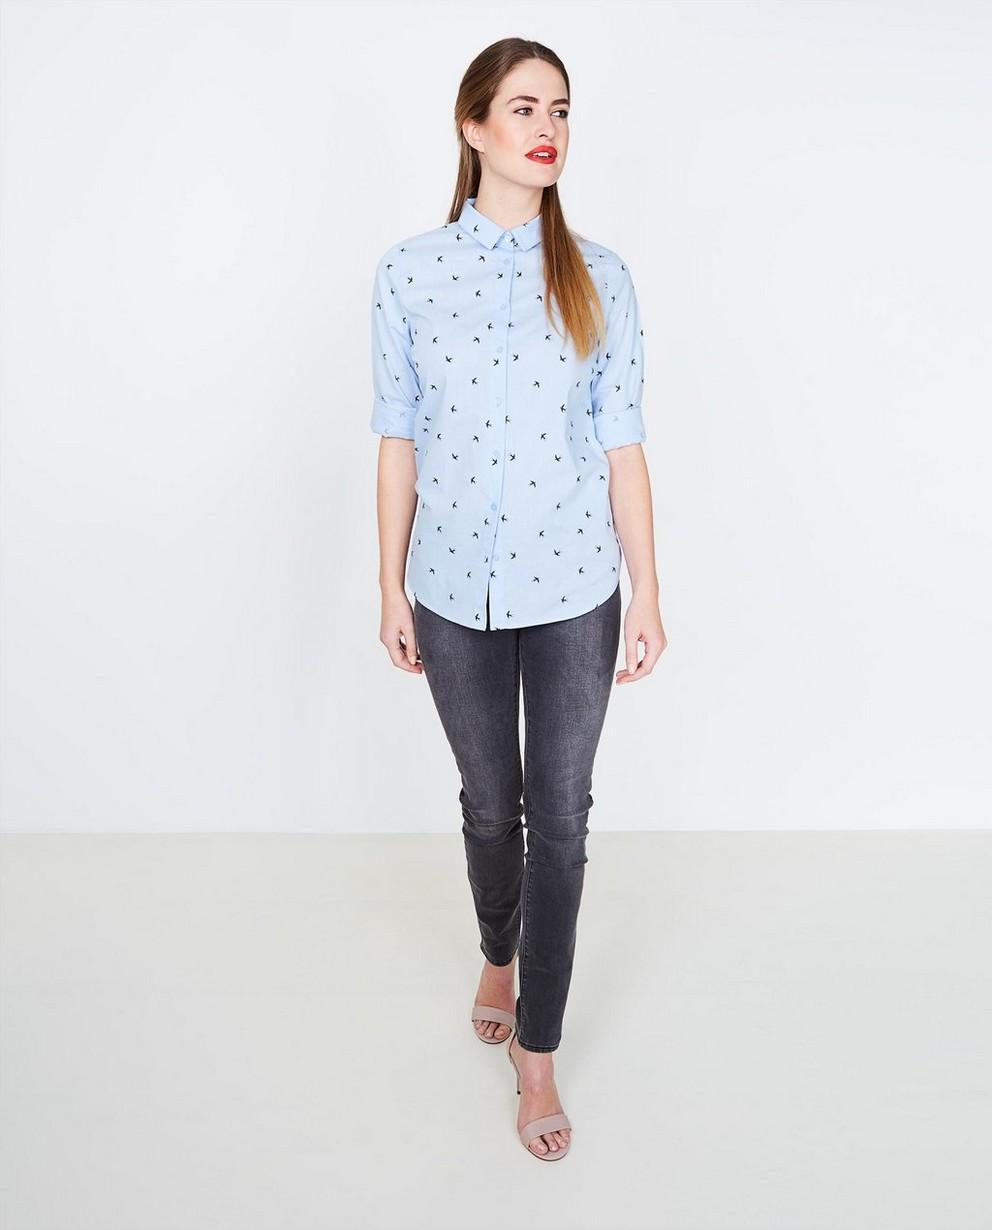 Hemelsblauw hemd - met allover vogelprint - JBC